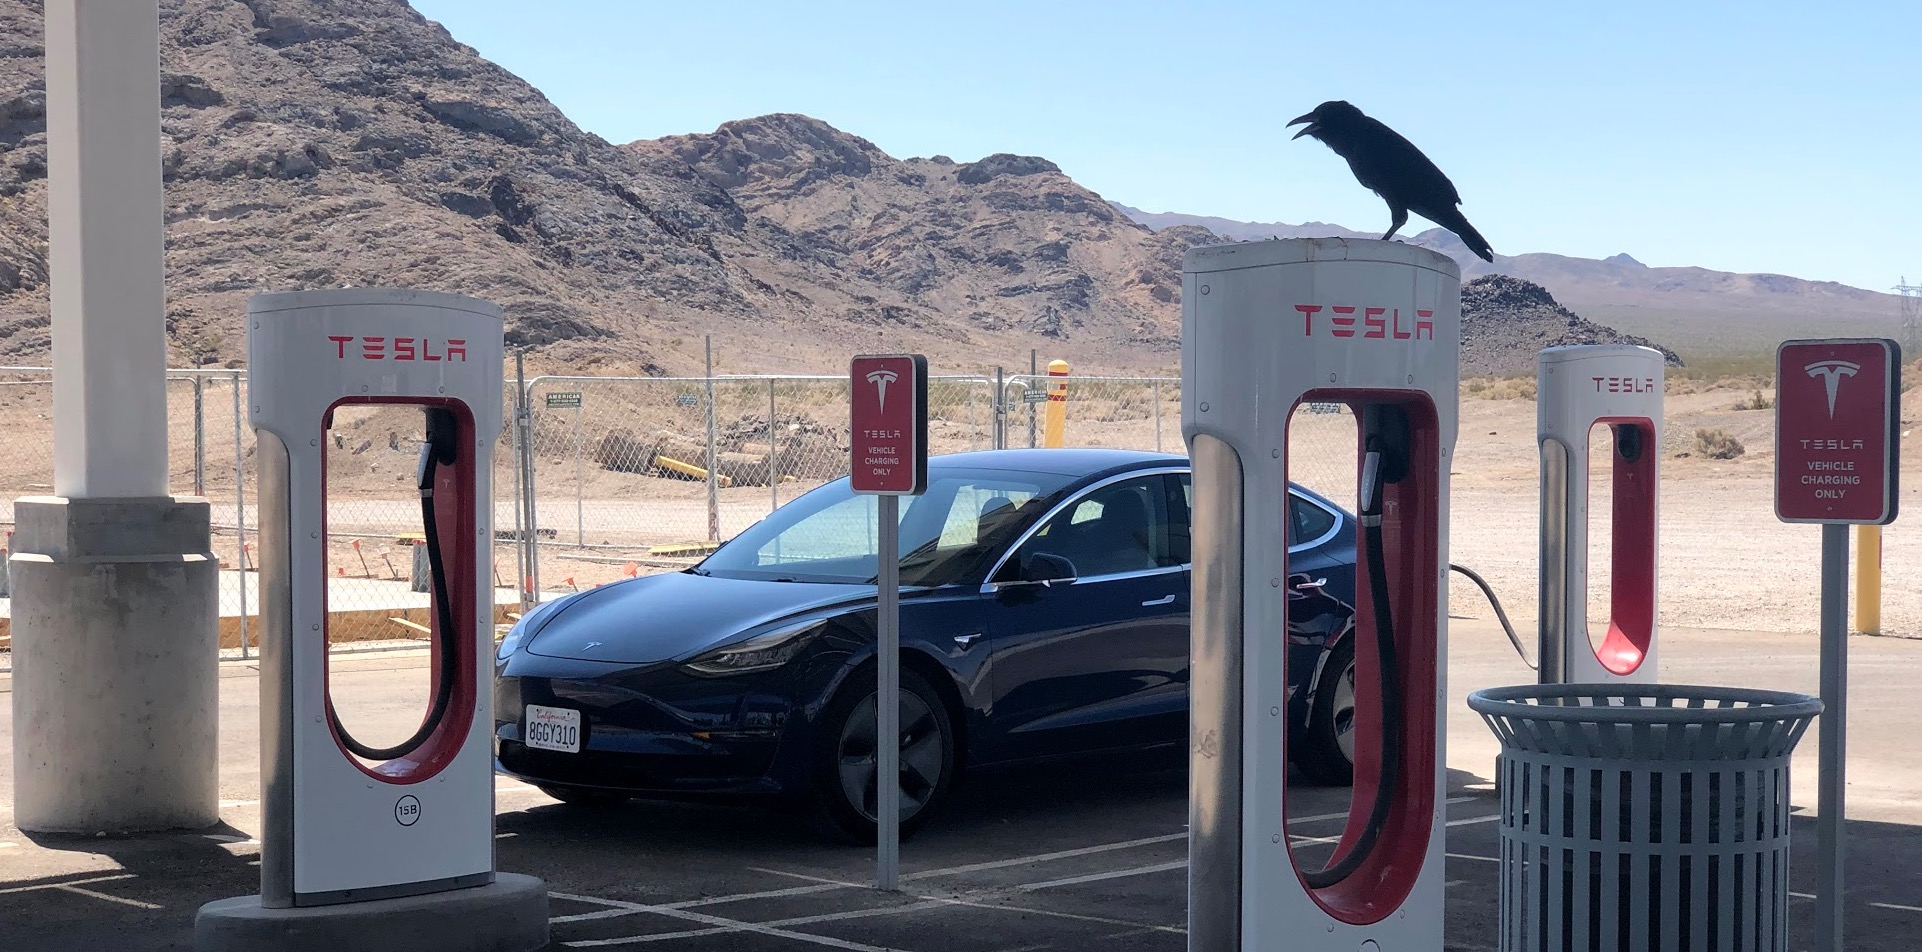 Best Road Trip Car: Tesla Model 3 Is The Best Road Trip Car